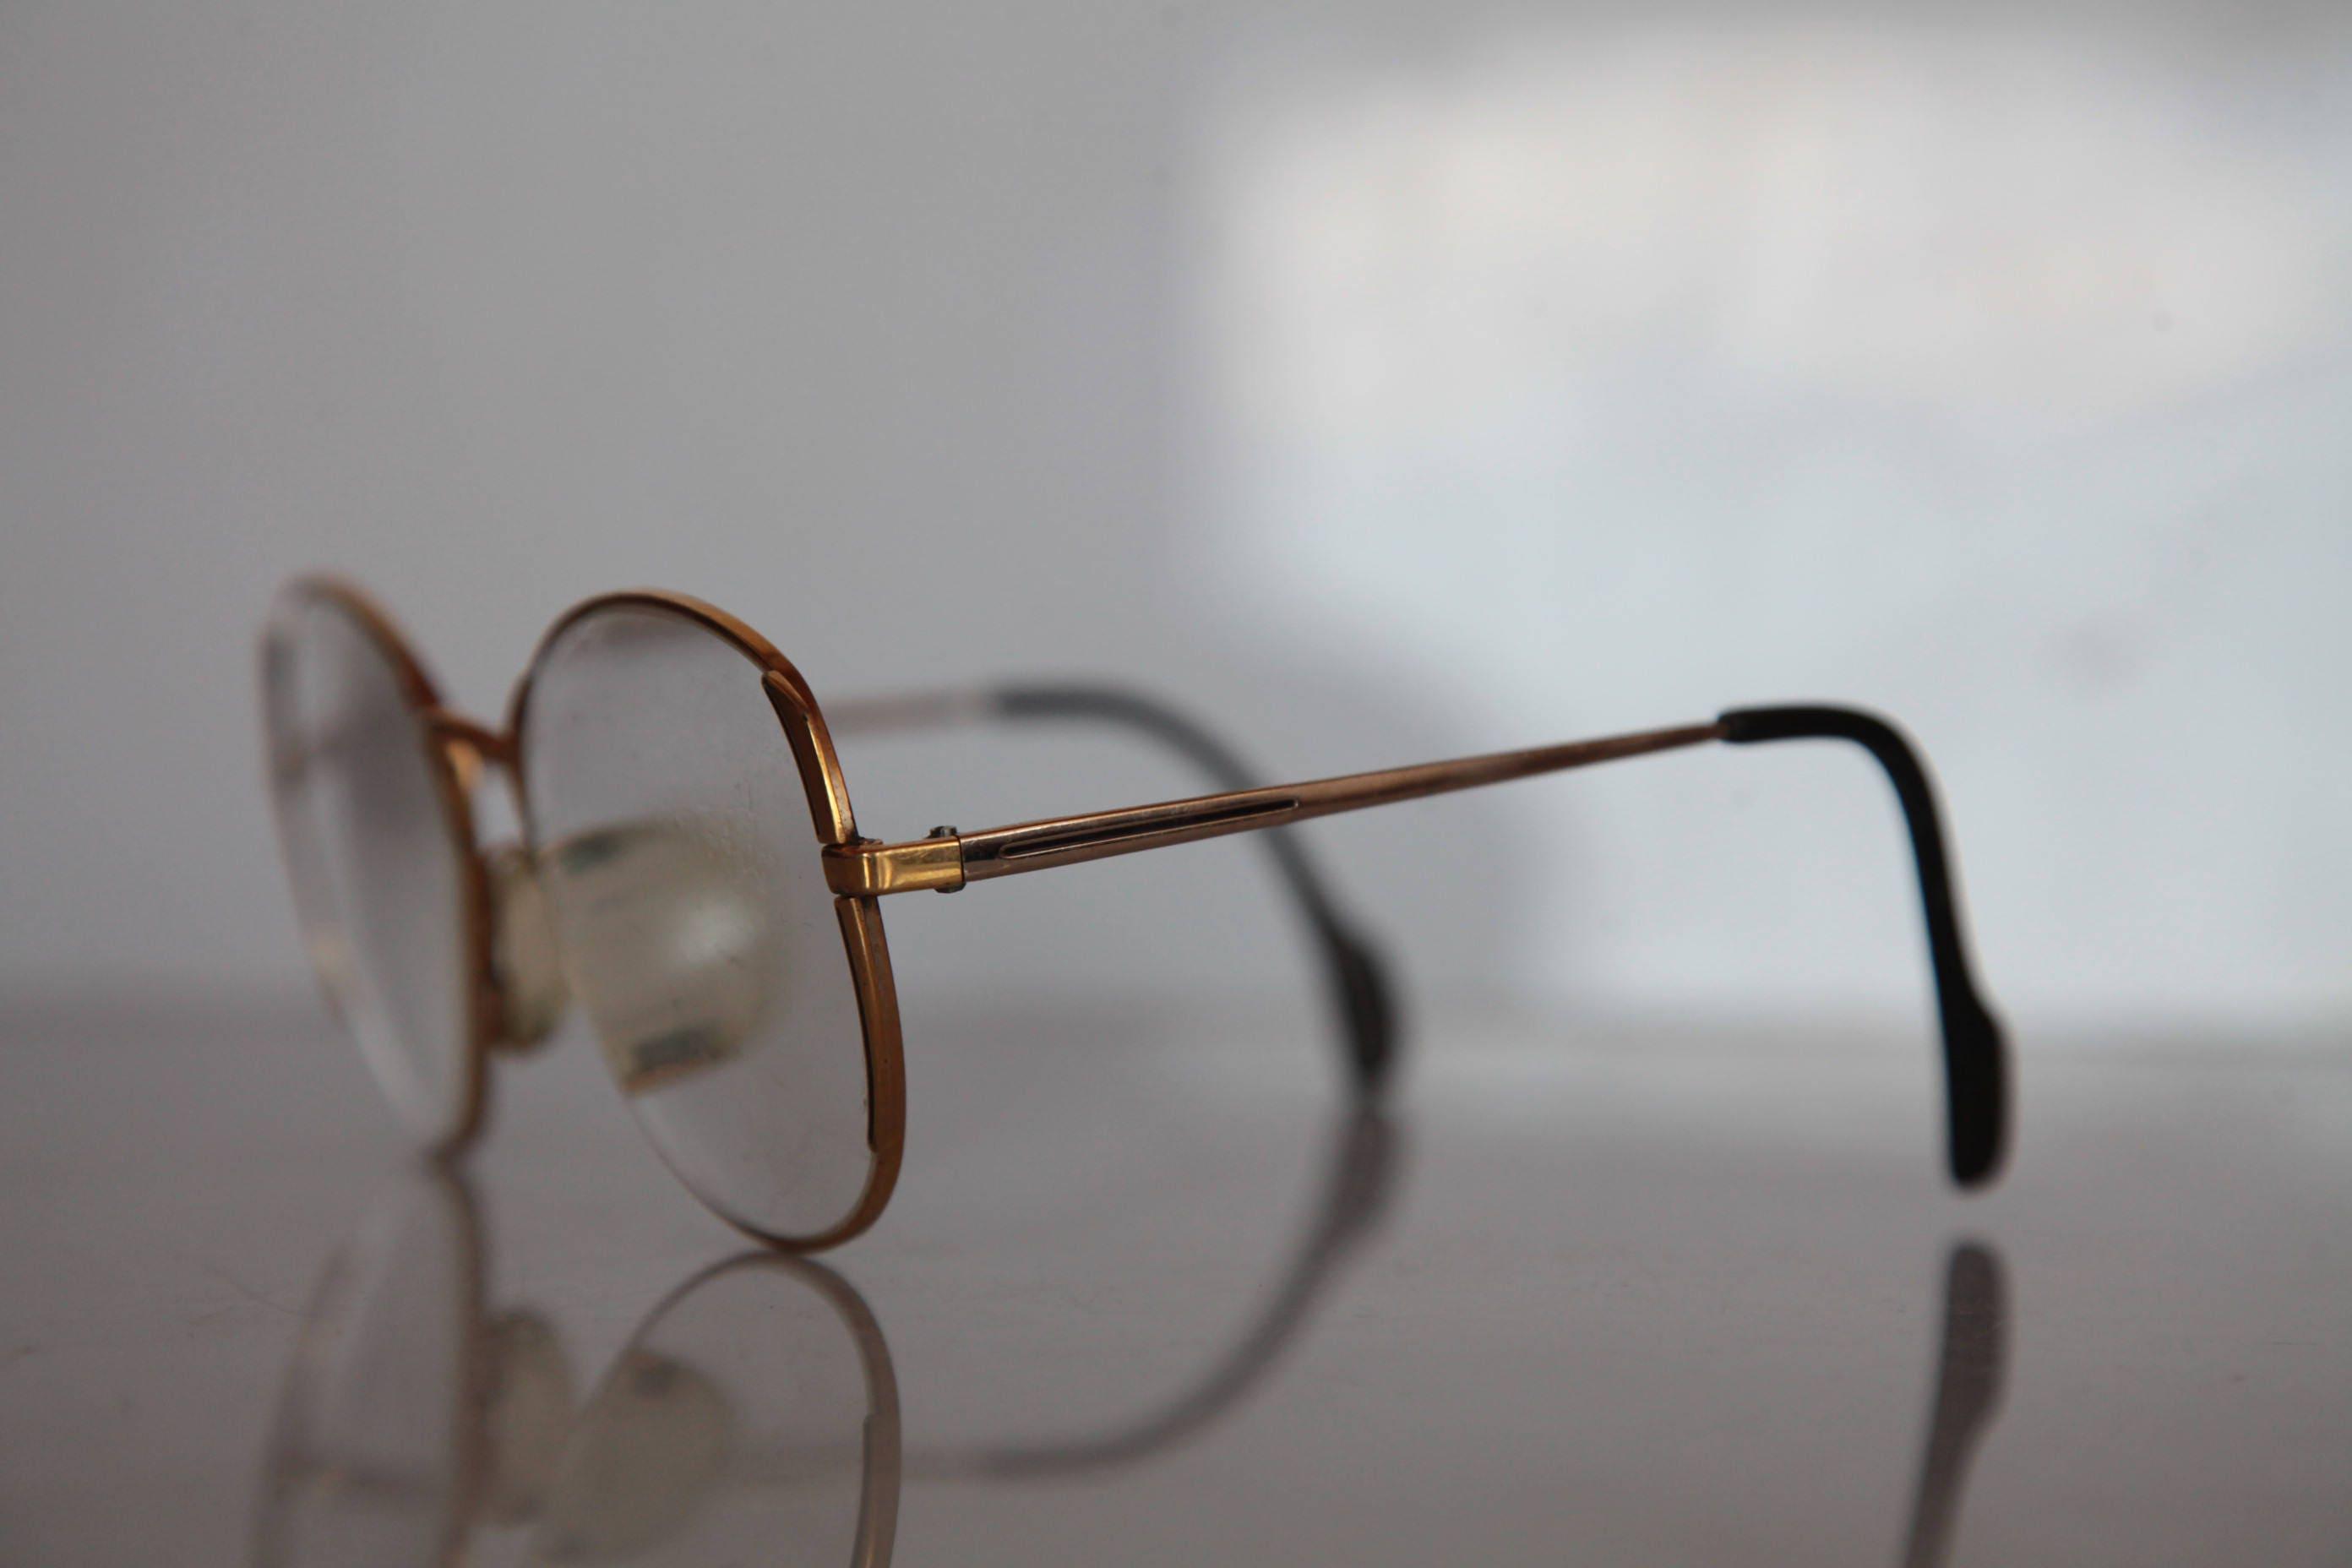 7cc6359de7d Vintage METZLER 0700 224 Eyewear